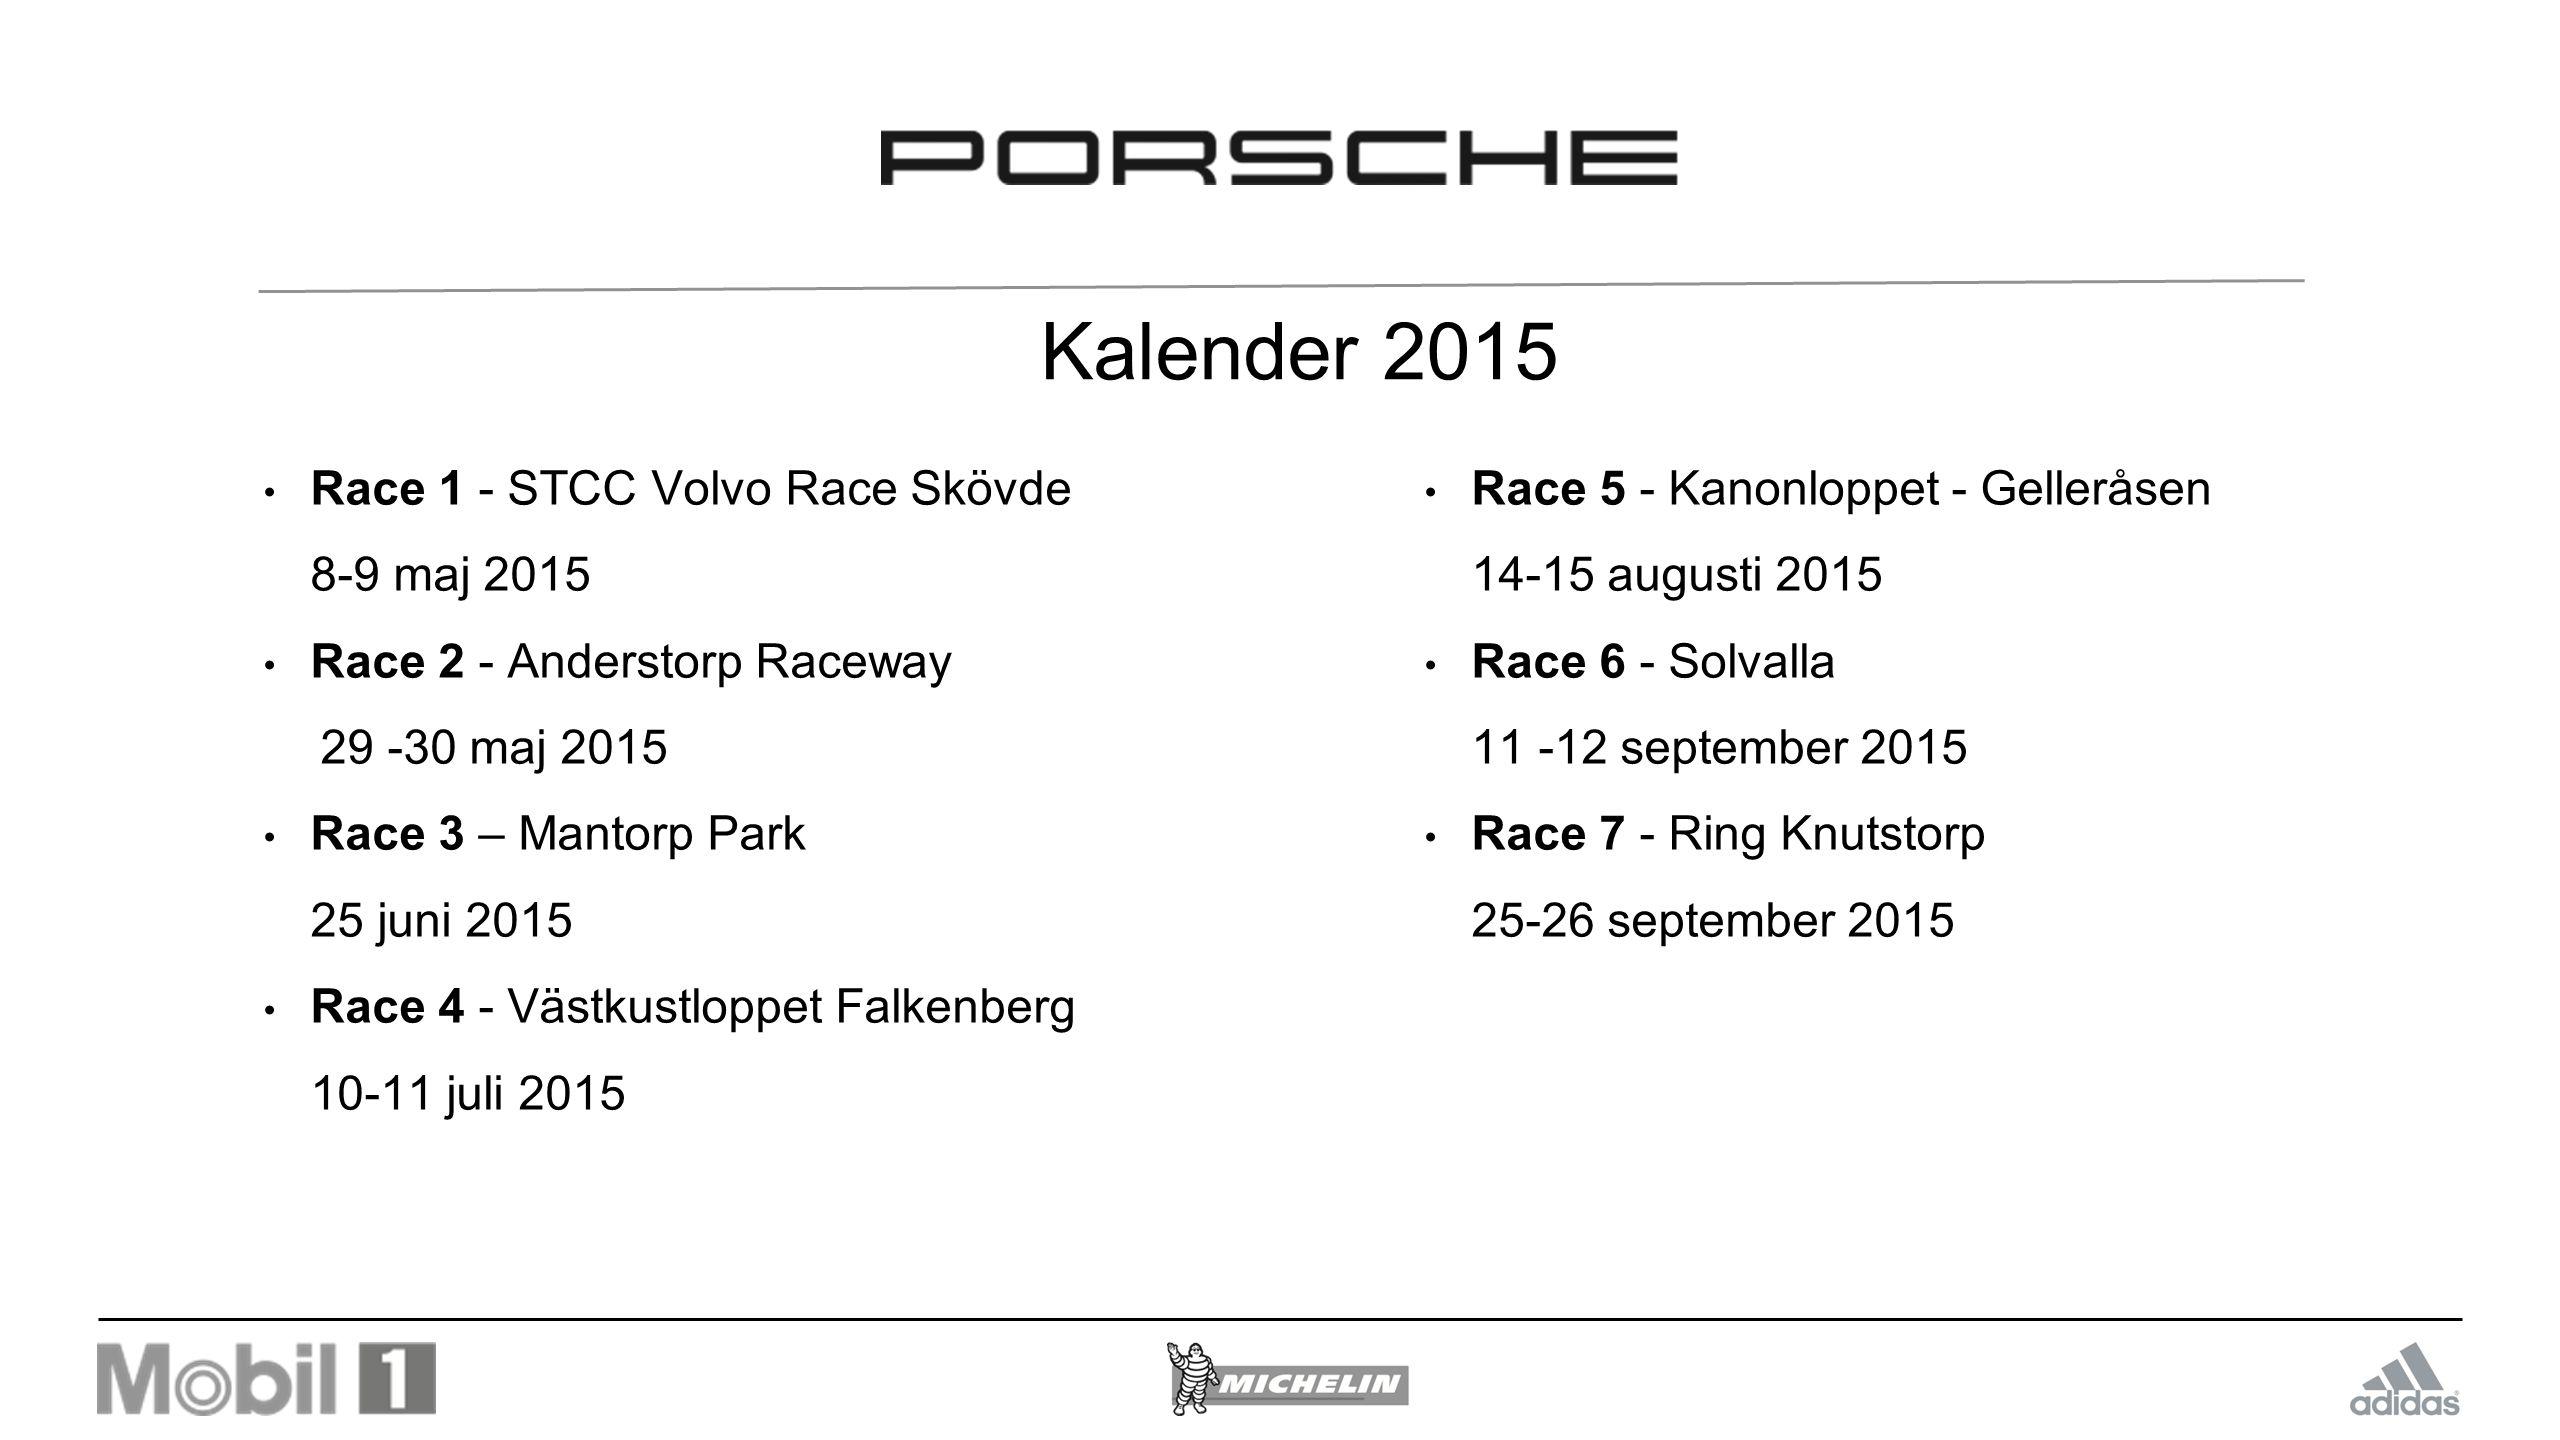 Porsche GT3 Cup Challenge 2015 Startavgift:25.000 kr + 6 % moms Anmälan:Anmälningsdatum 15 mars Betalning 2 april Test:Karlskoga 11 april Kategori 1: 997 MY 2010-2013 Kategori 2: 997 MY 2005-2009 (+ 35 kg MY 2008-2009 enligt PCCS 2008).